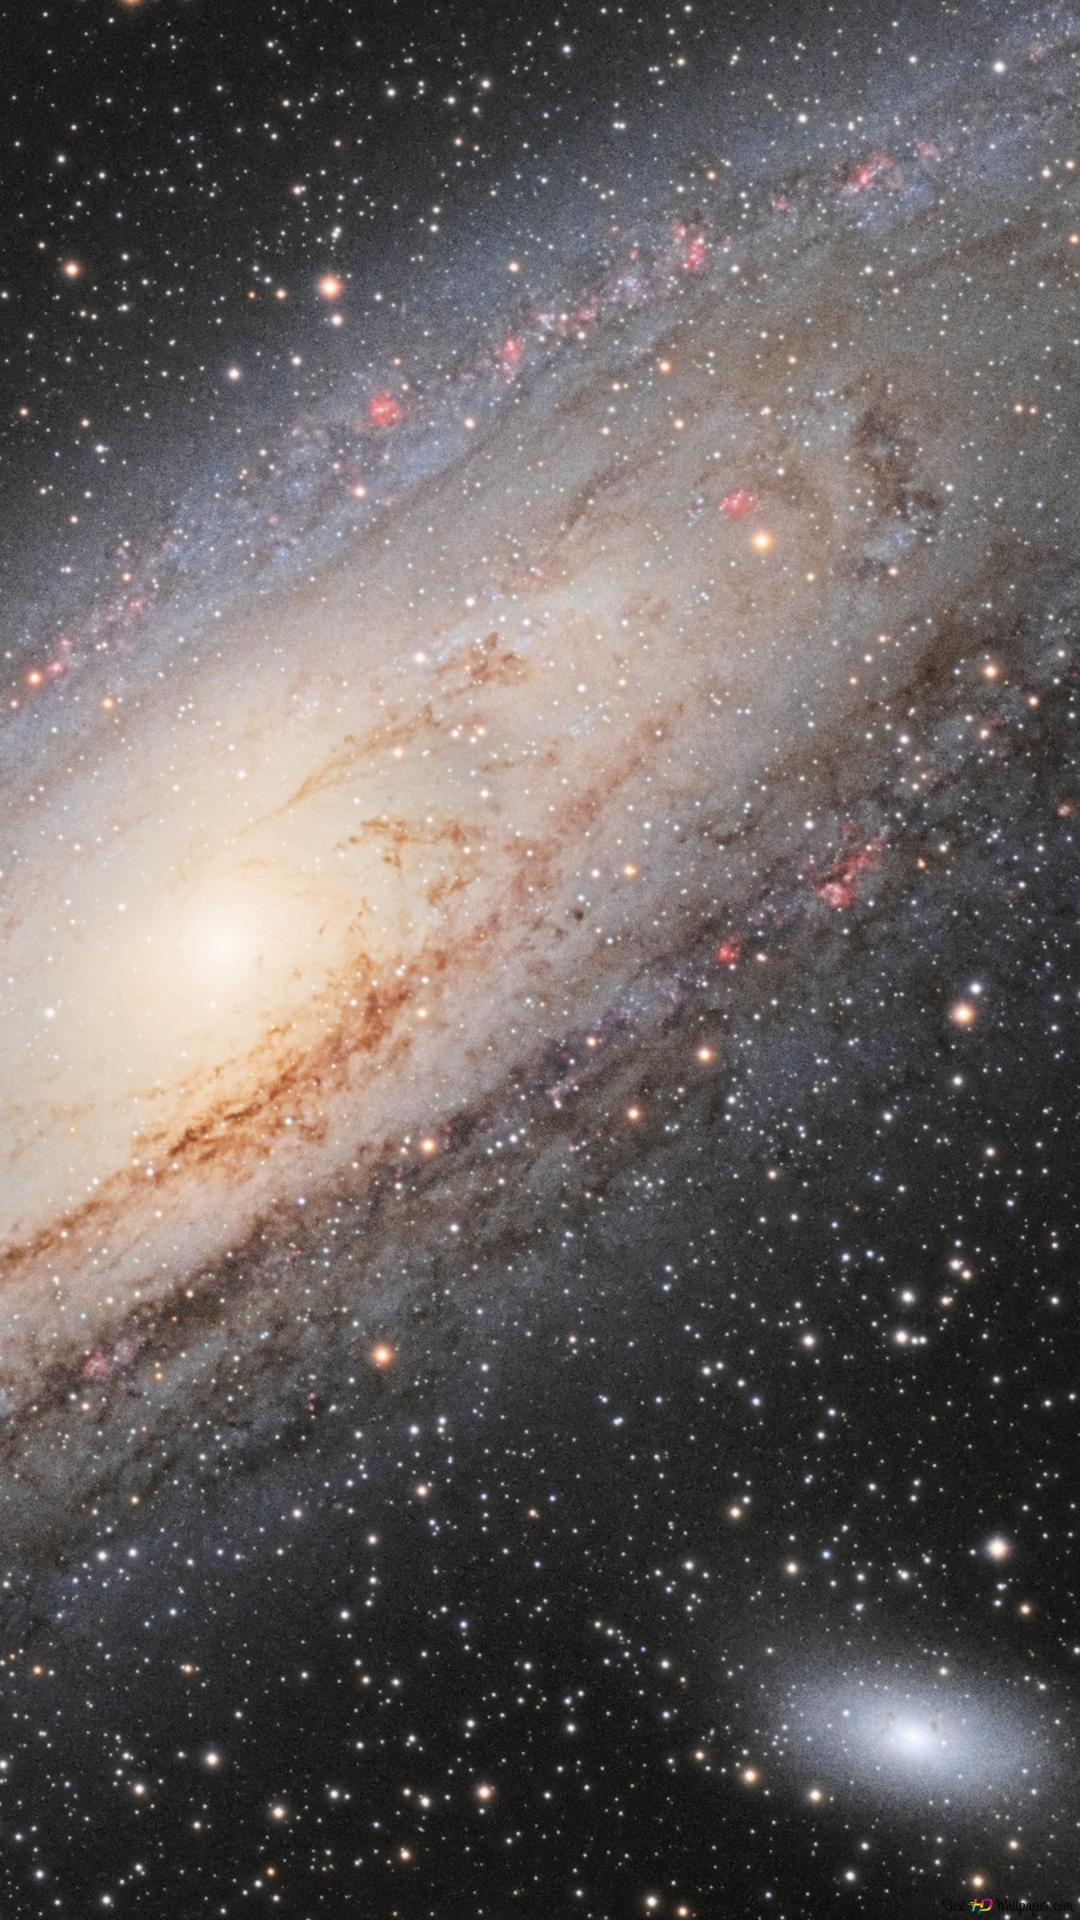 Galaxy Et Etoiles Hd Fond D Ecran Telecharger